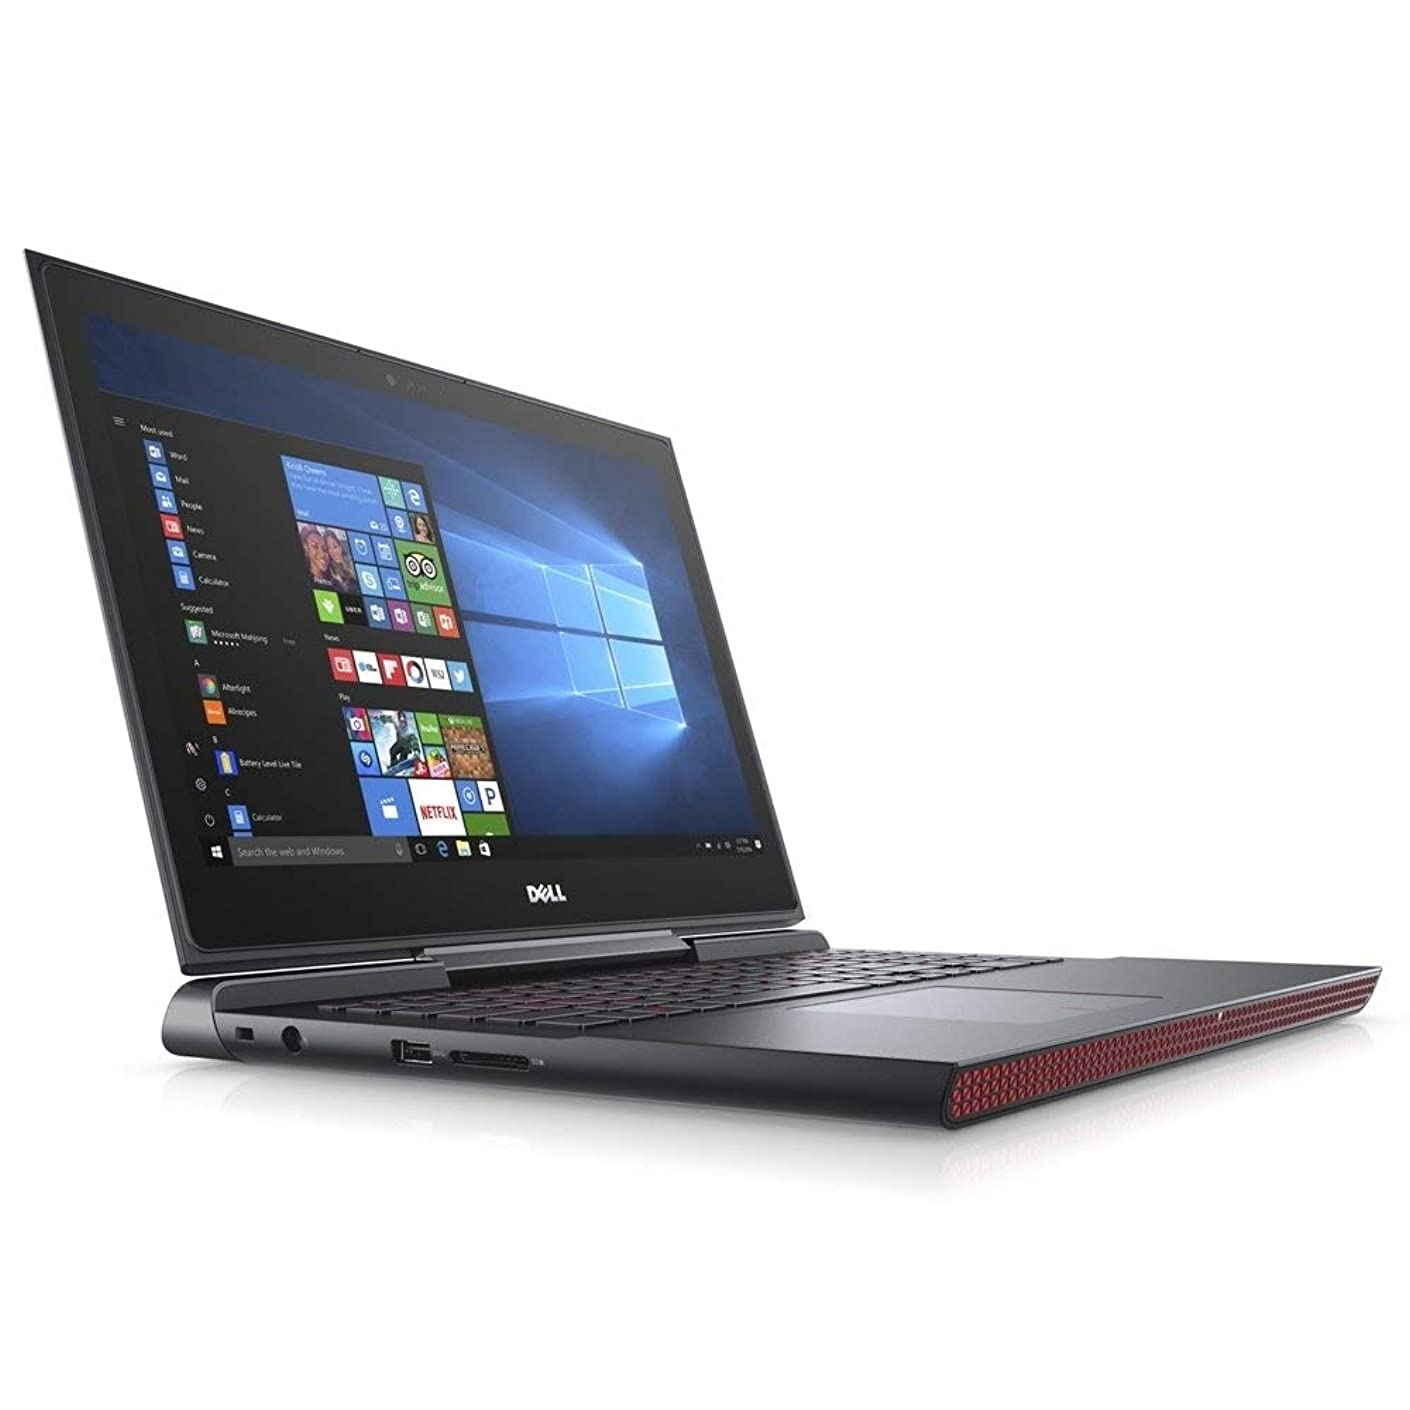 Dell Inspiron 15-7567 Intel Core i7-7700HQ X4 3.8GHz 16GB 1TB+128GB SSD 15.6